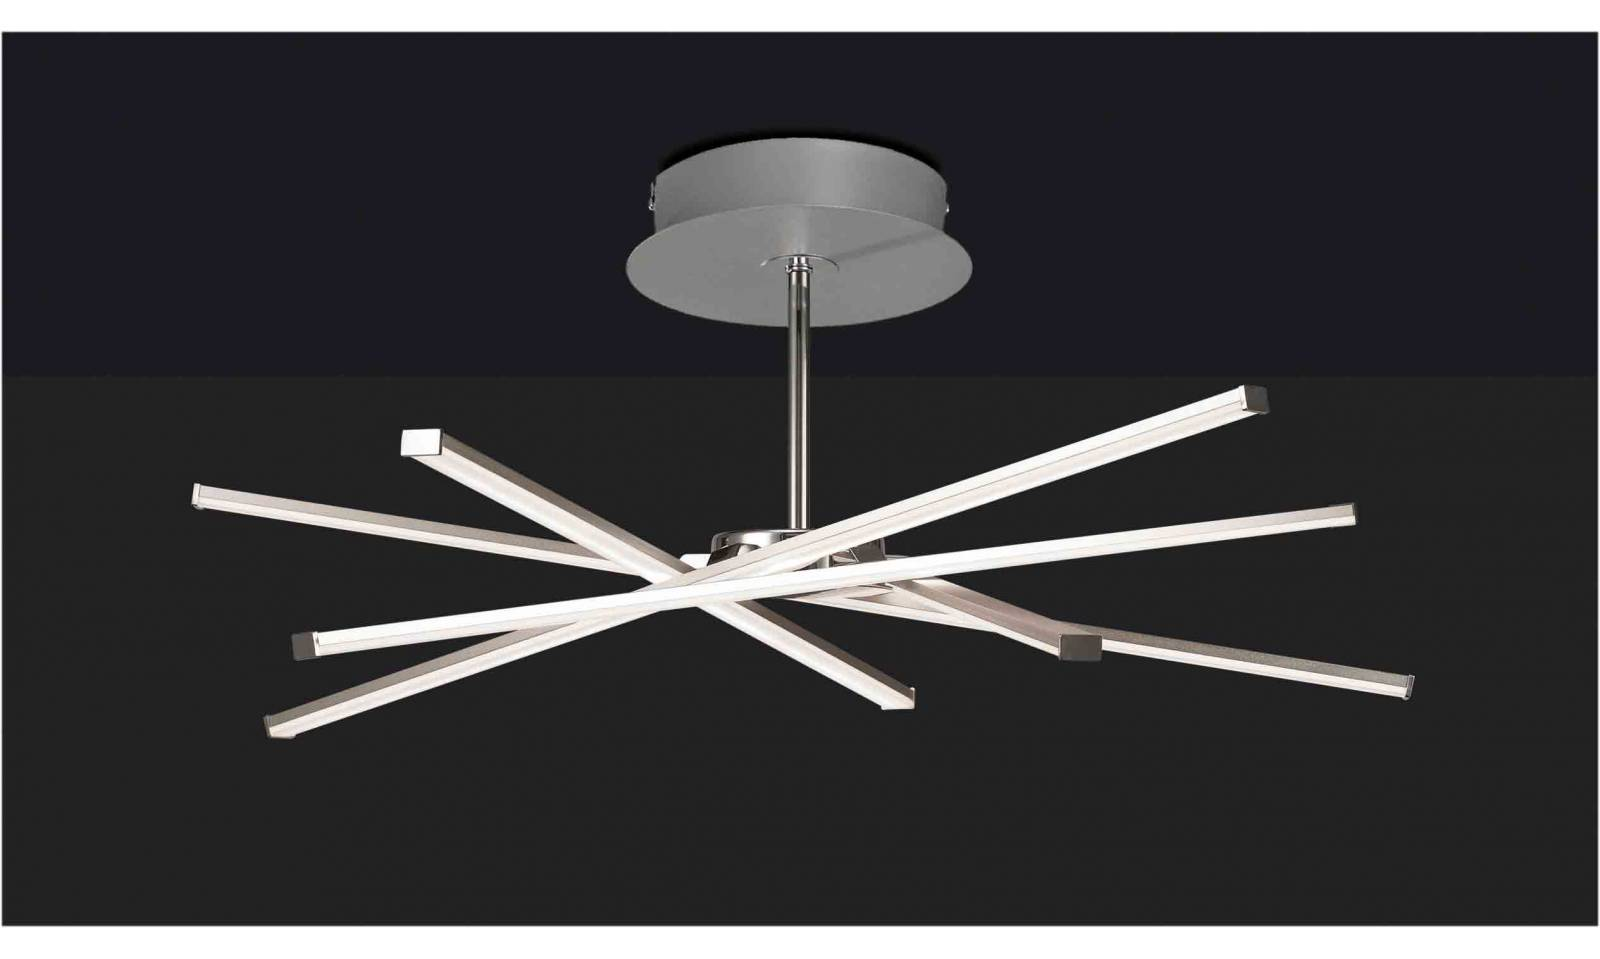 Plafoniera Vimini : Mantra illuminazione plafoniera star lampada led